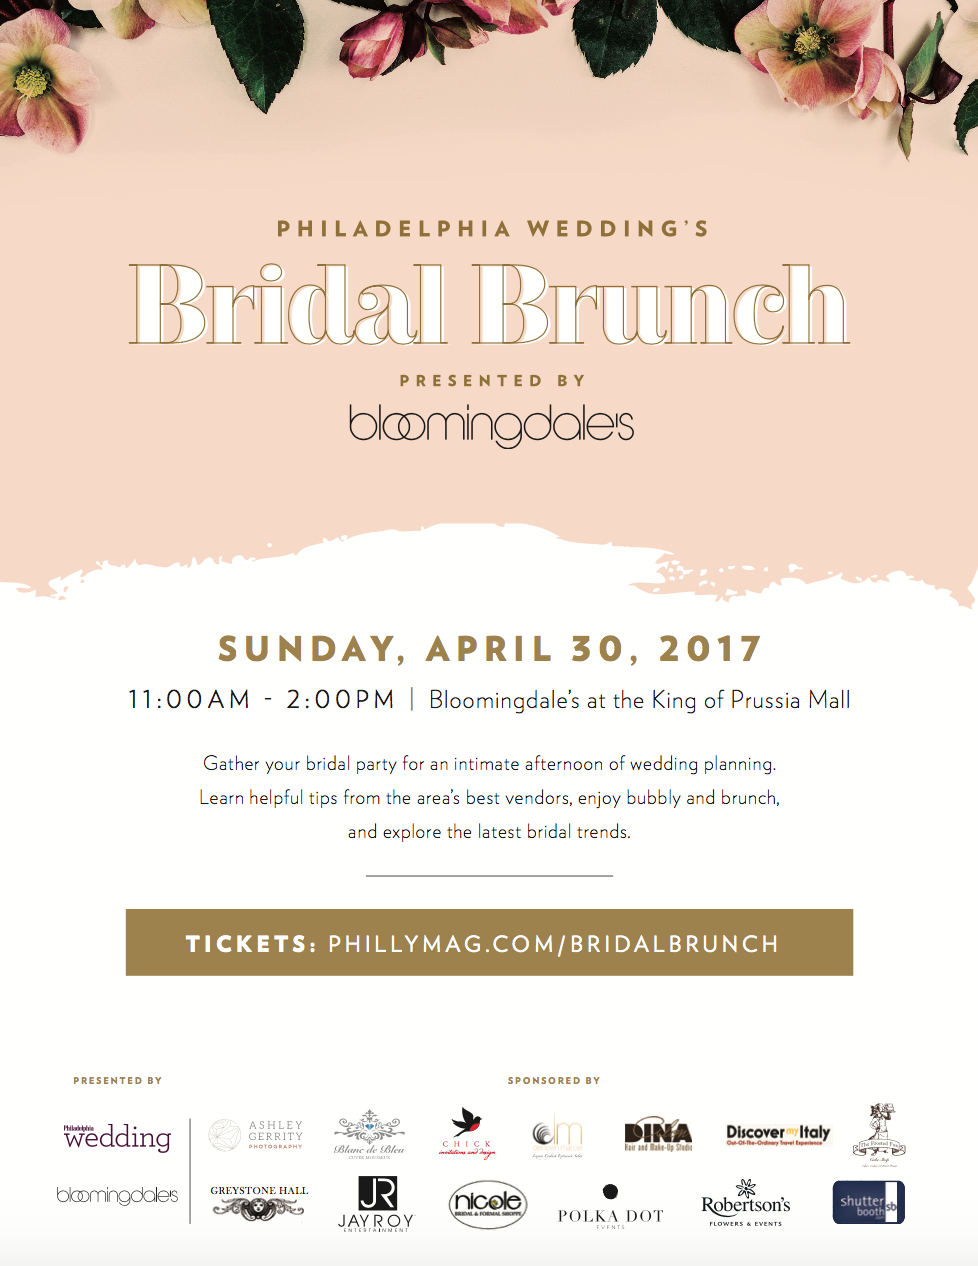 philly bridal brunch